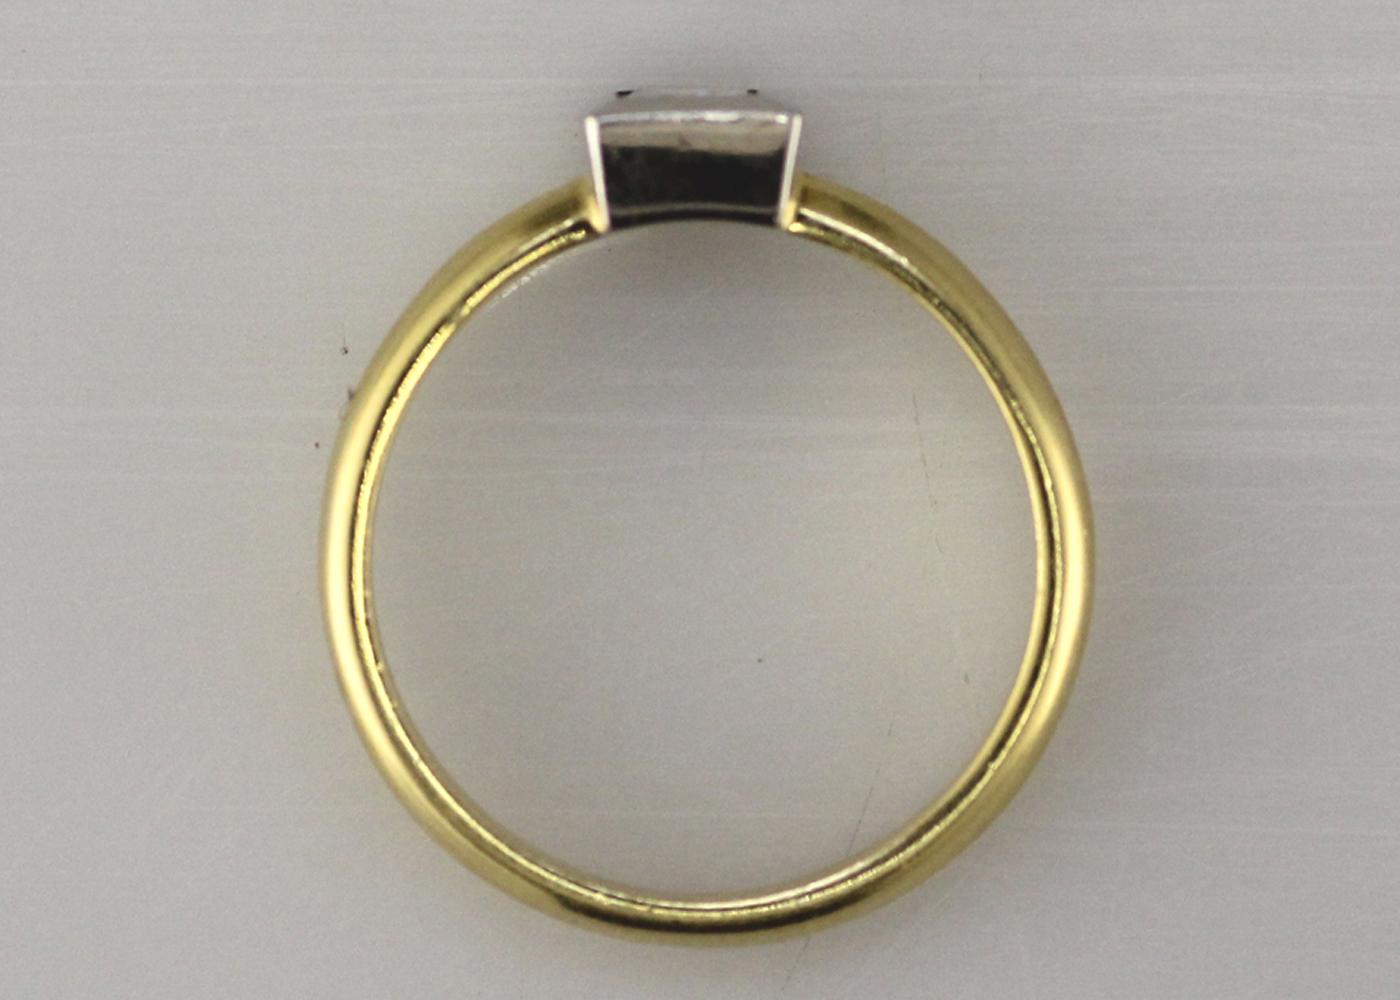 18ct Princess Cut Rub Over Diamond Ring 0.45 Carats - Image 7 of 8